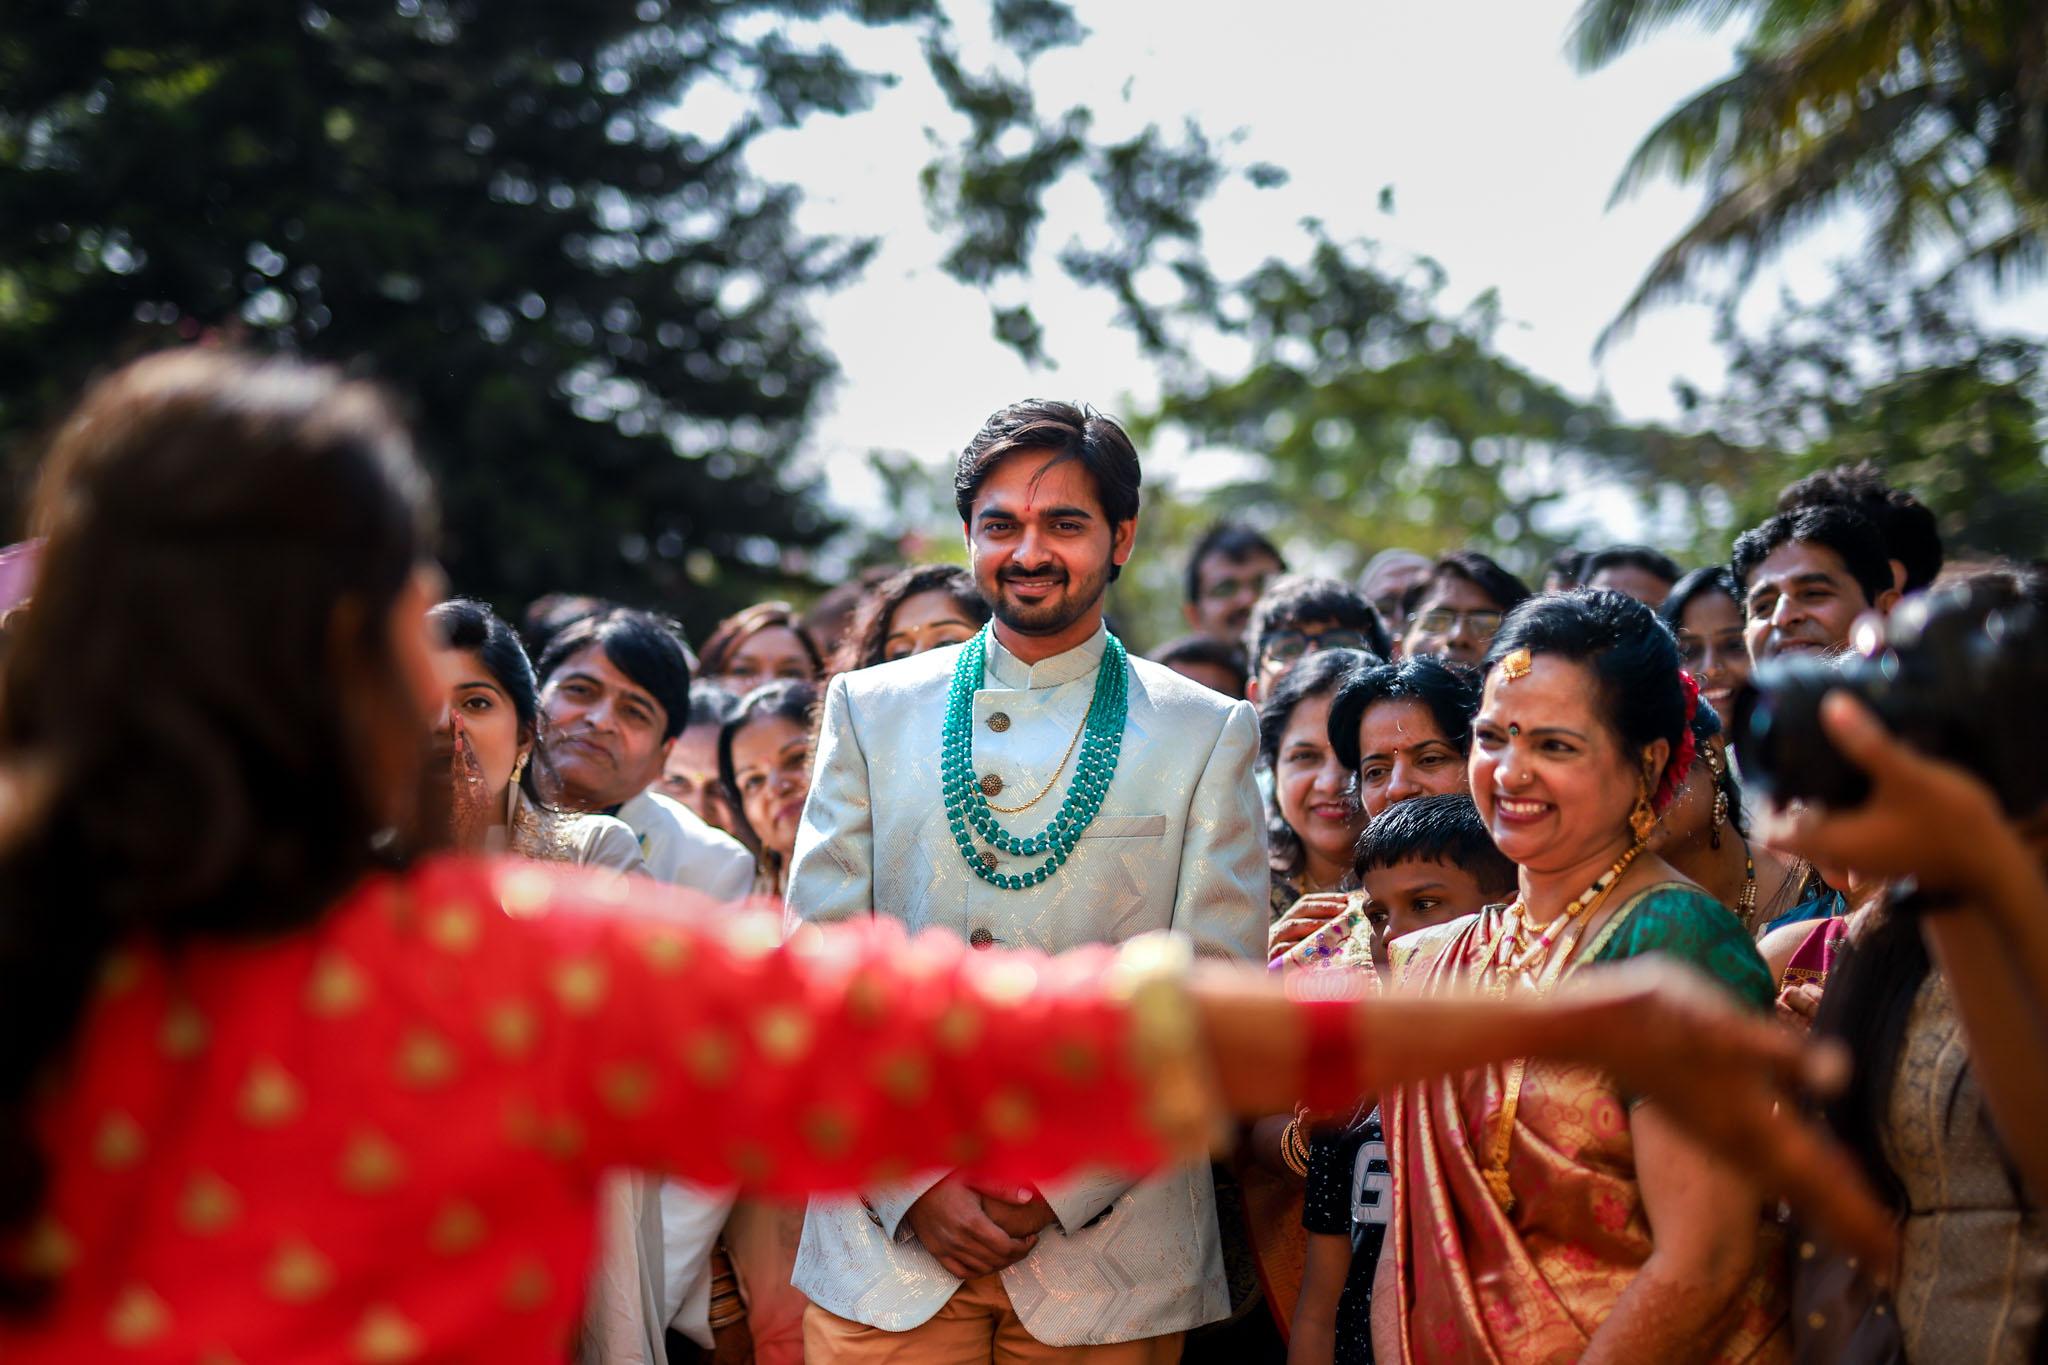 Mukti x Ojas Wedding Akshjay Sansare Photography Best wedding photographer in mumbai India Candid Cinematic Films videos-3.jpg